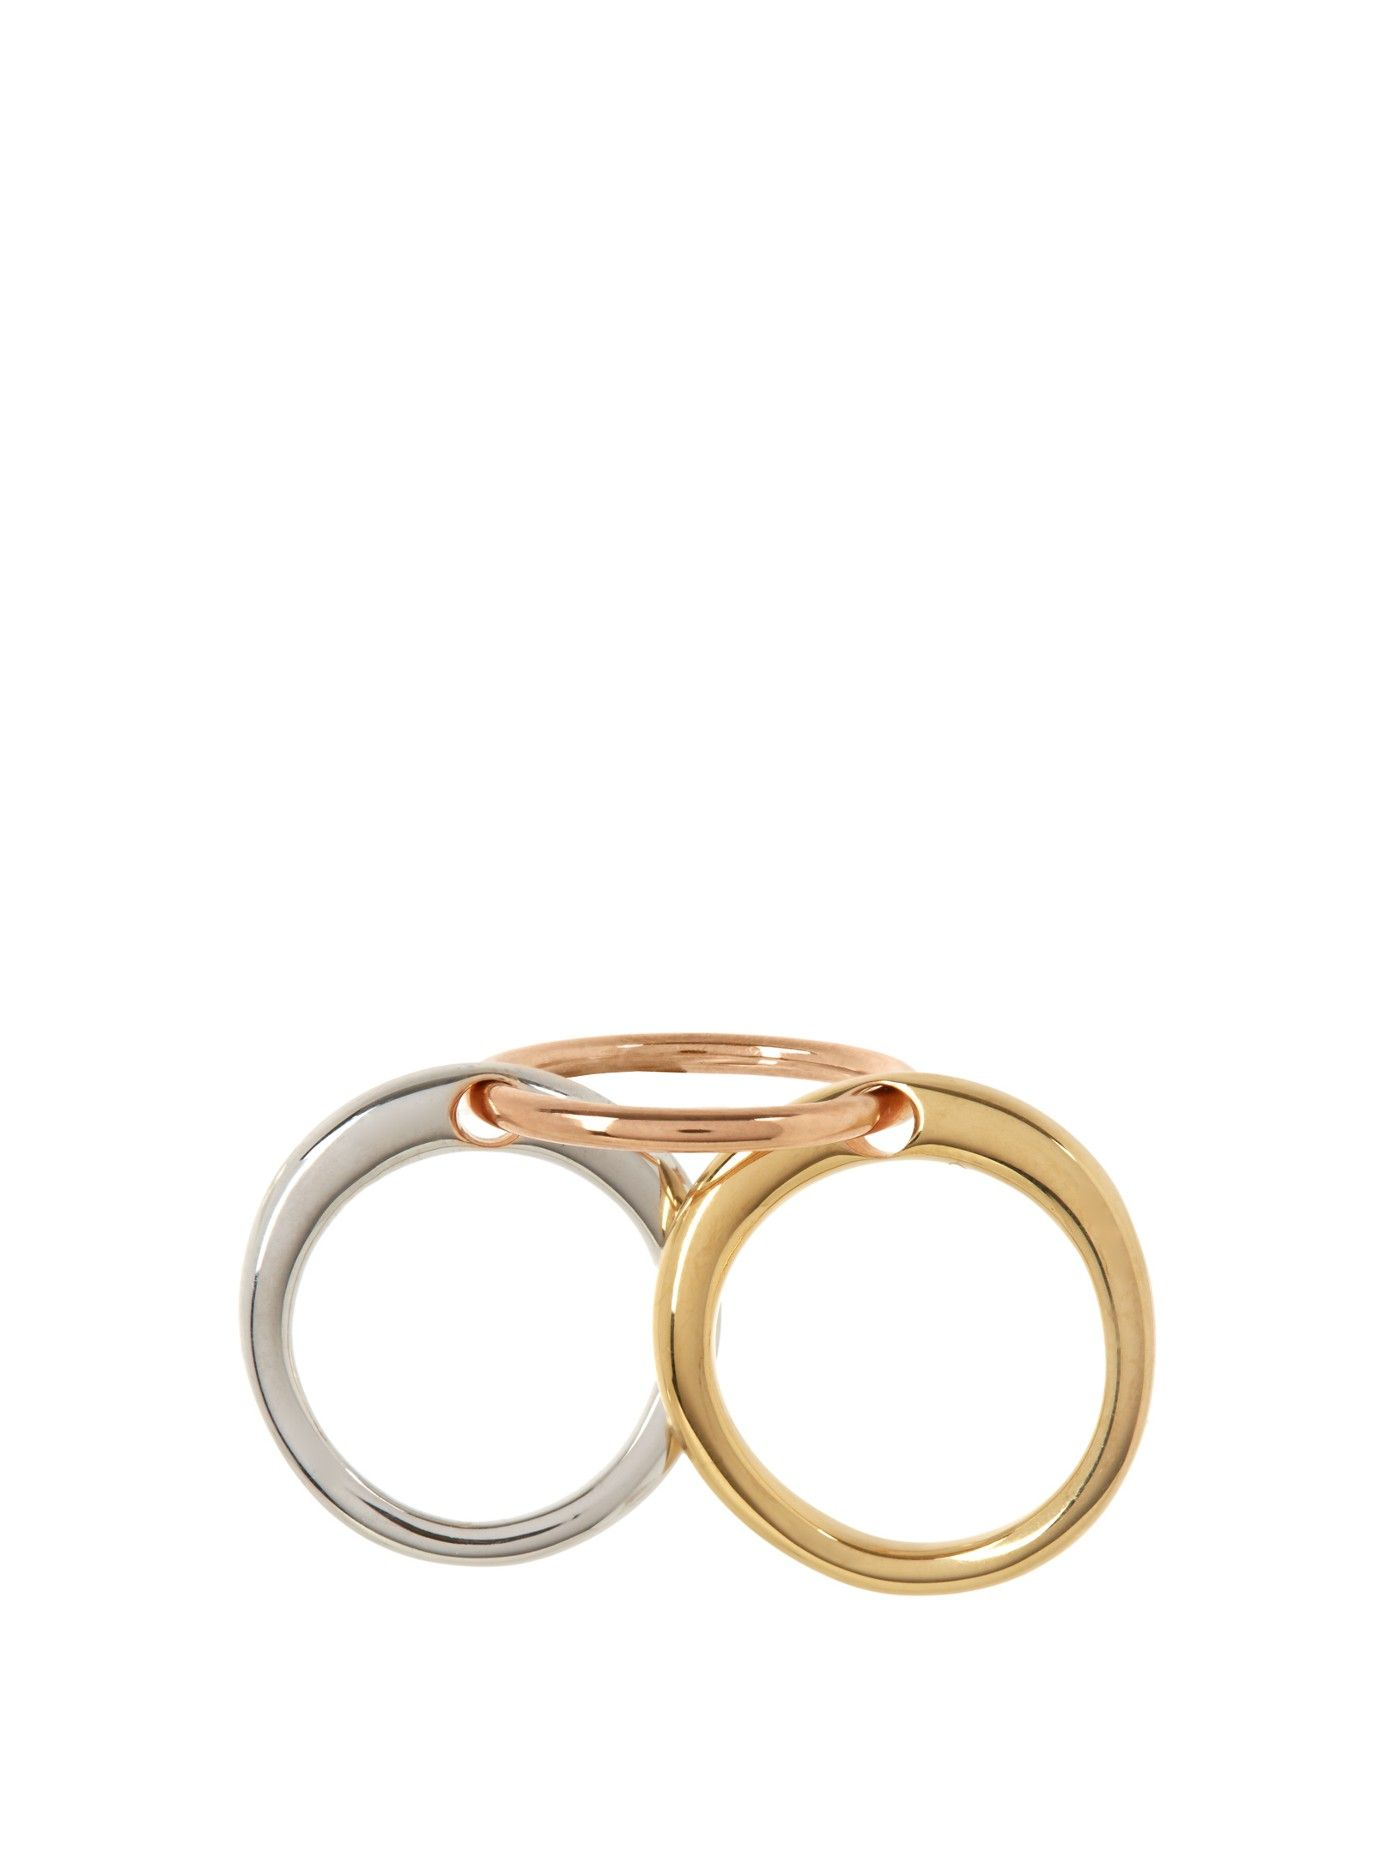 Neo Lover ring - Metallic Charlotte Chesnais 5EpxiU